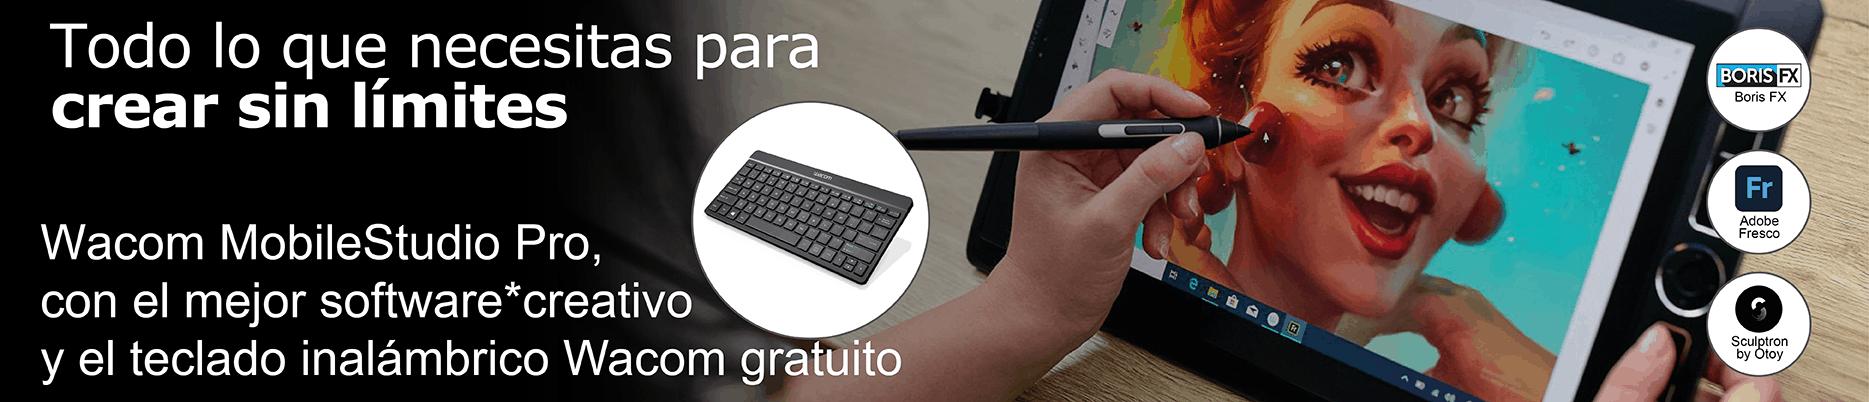 Wacom MobileStudio Pro teclado de regalo